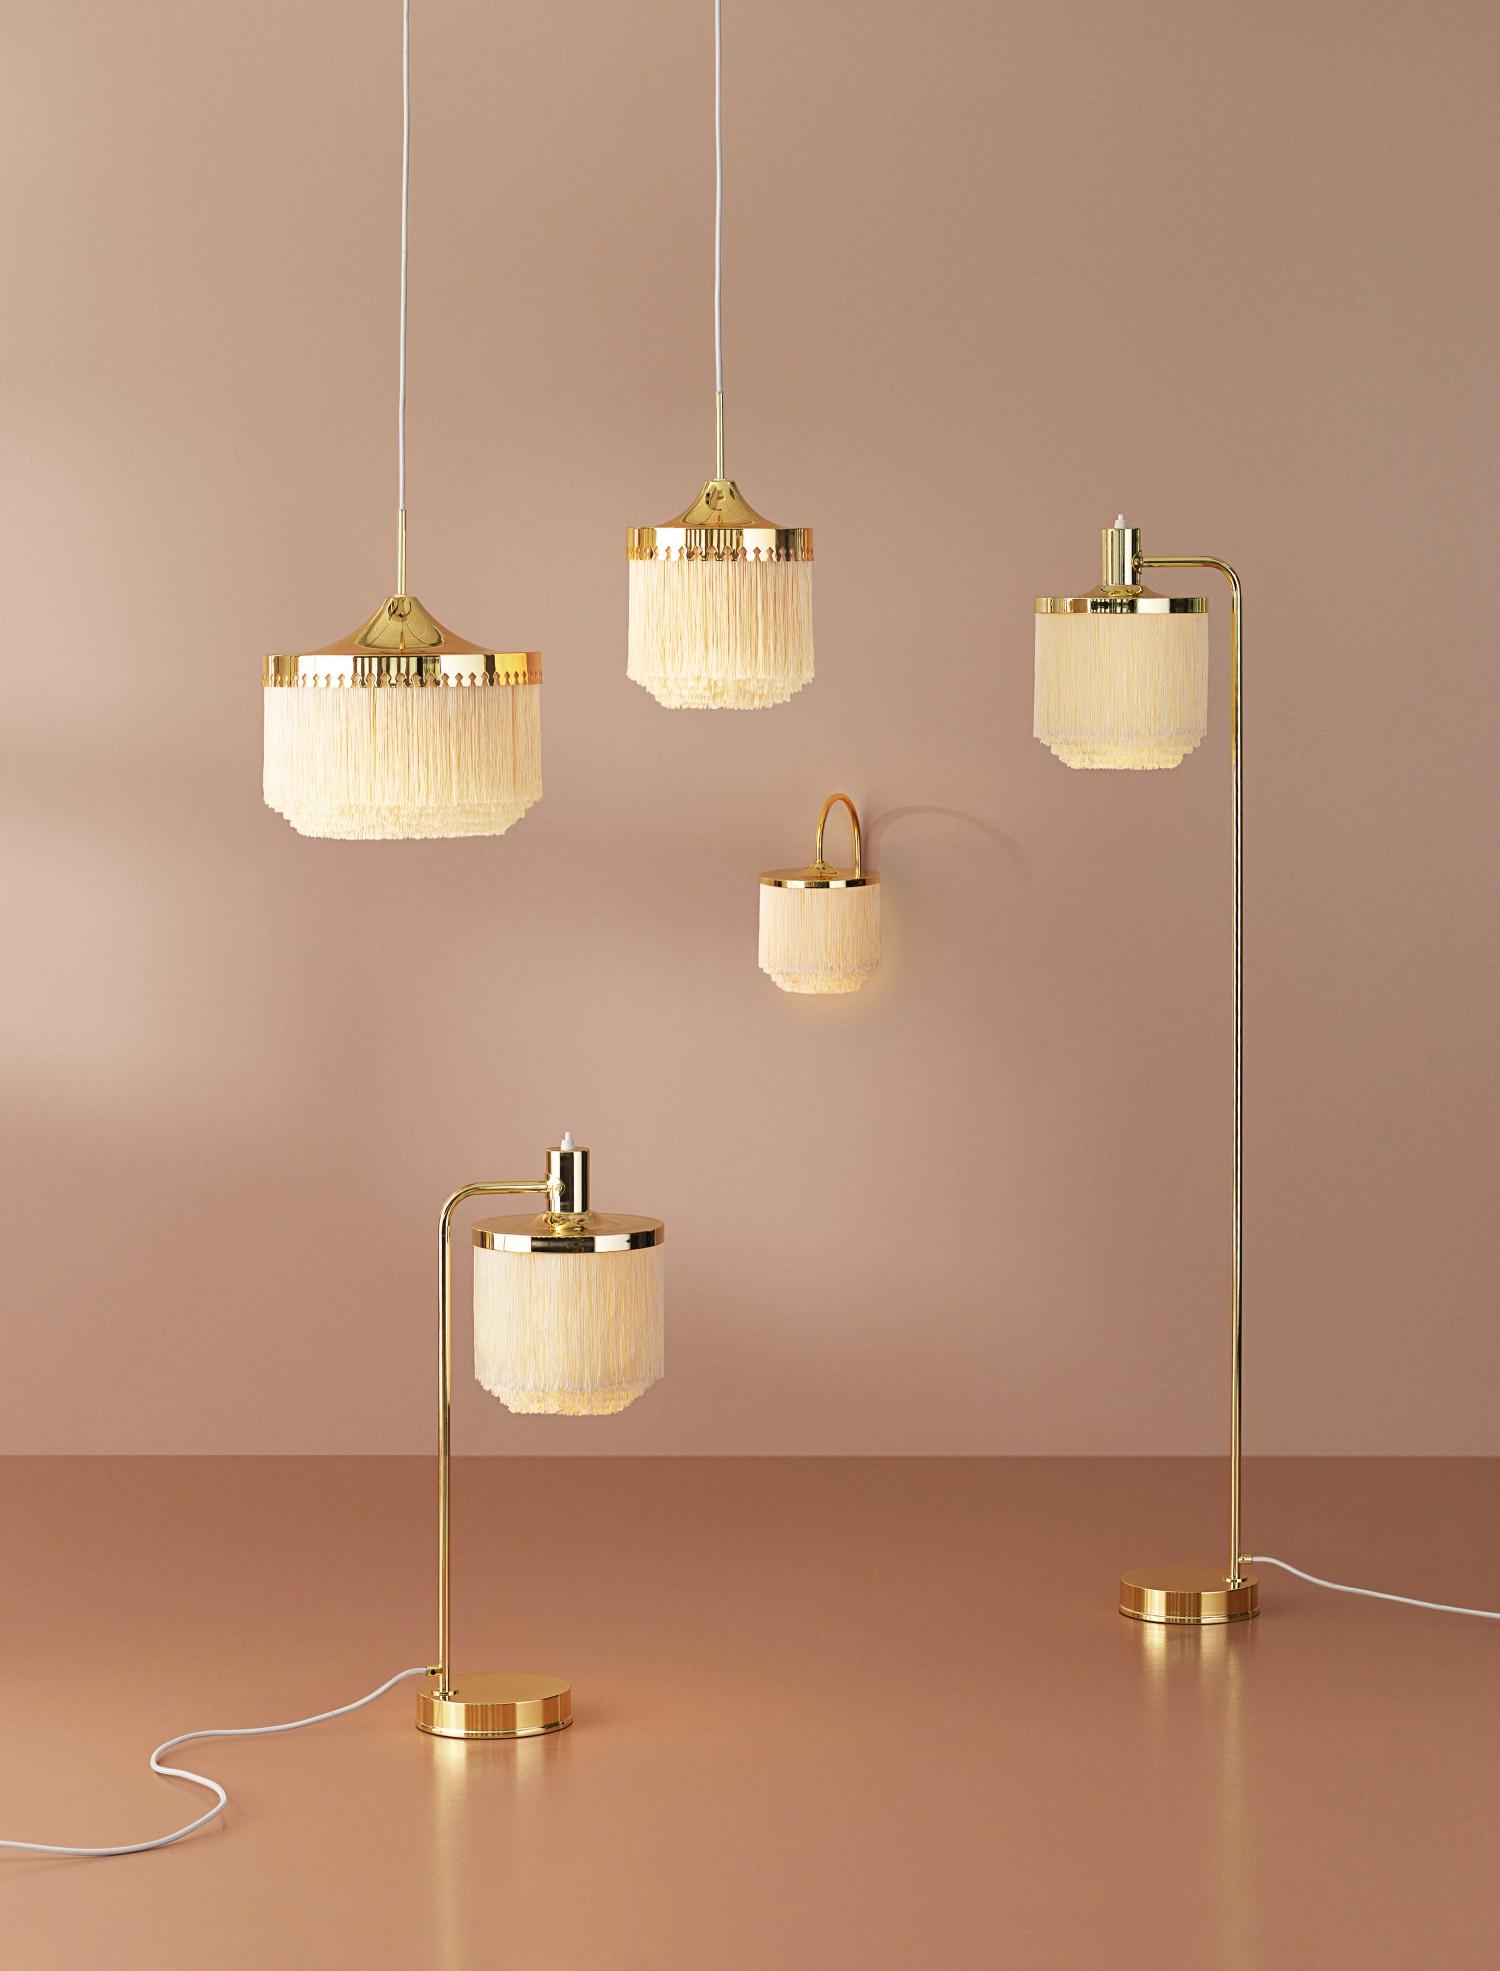 warmnordic-lighting-fringe-lamps-creamwhite-family-vnude